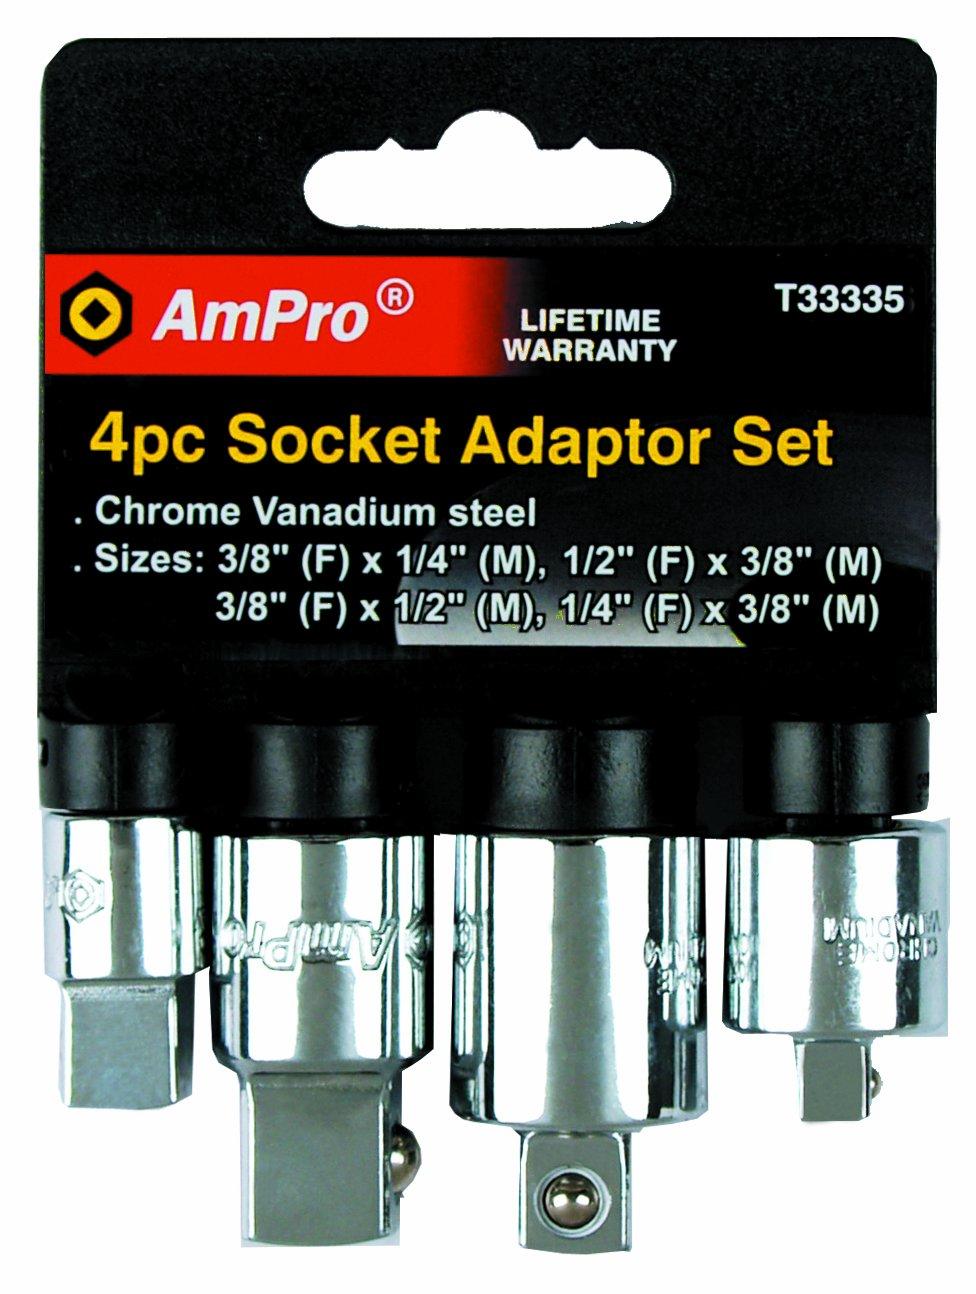 AMPRO T33335 Socket Adaptor Set, 4-Piece